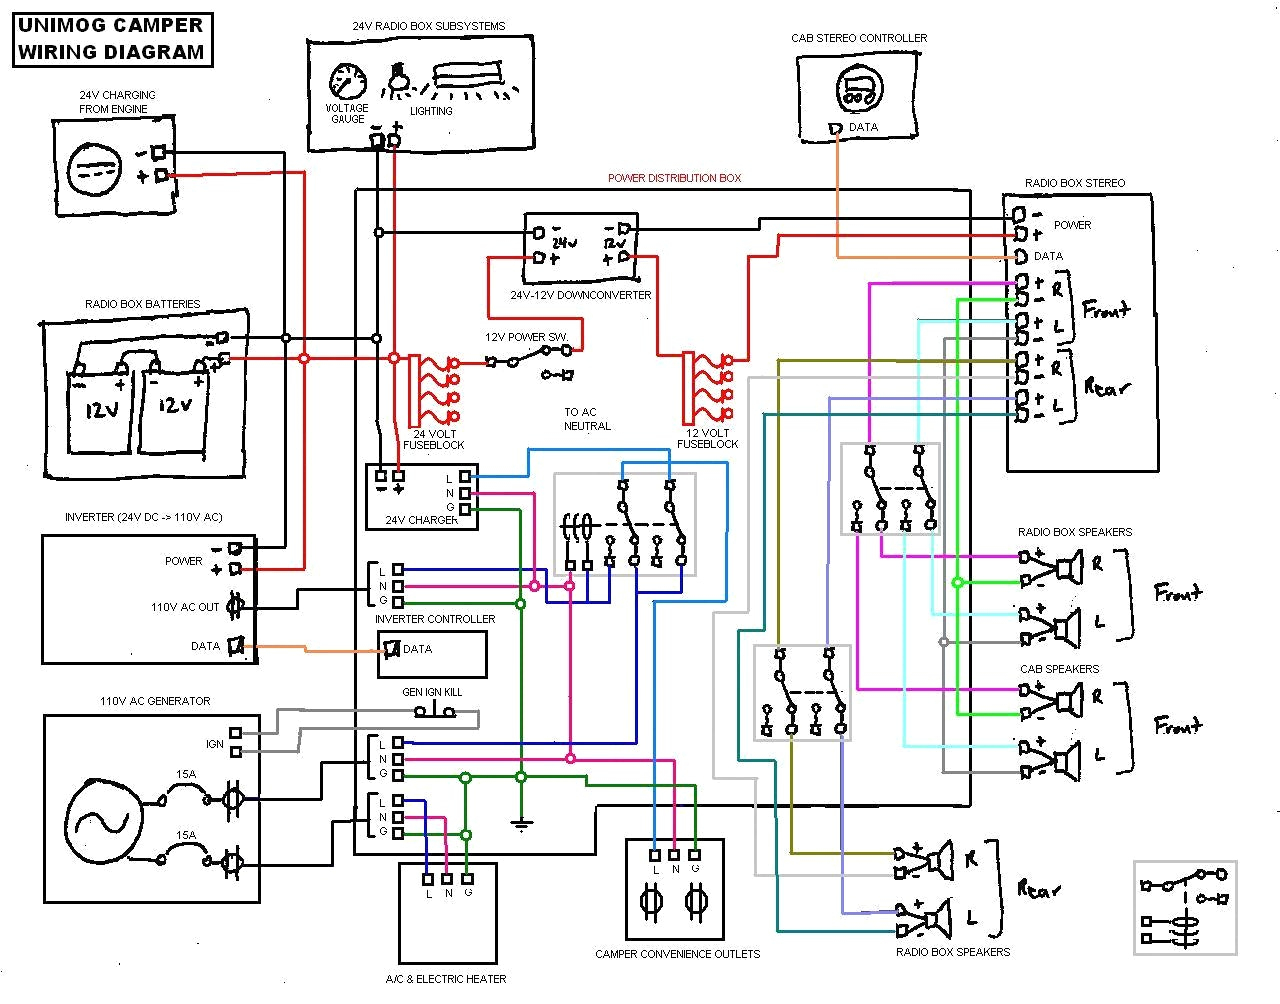 Rv 12V Electrical Wiring Diagram Lights | Wiring Diagram - 12 Volt Wiring Diagram